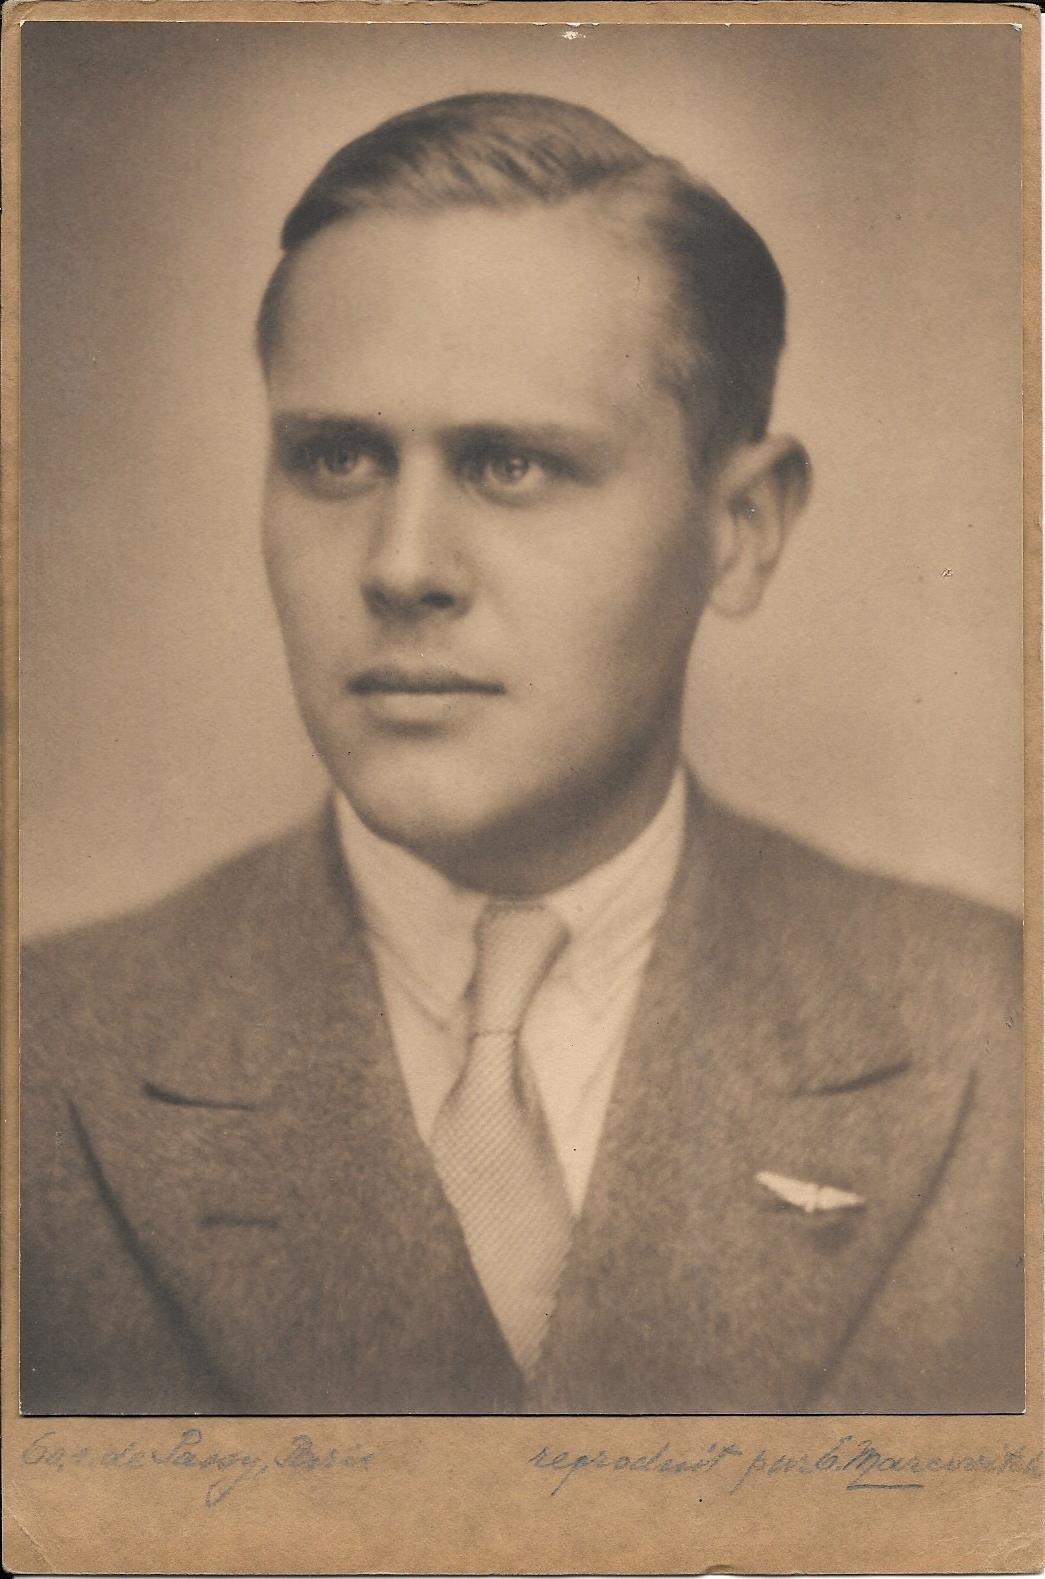 Nikita Dobrynine, le père d'Eugeny (1932)